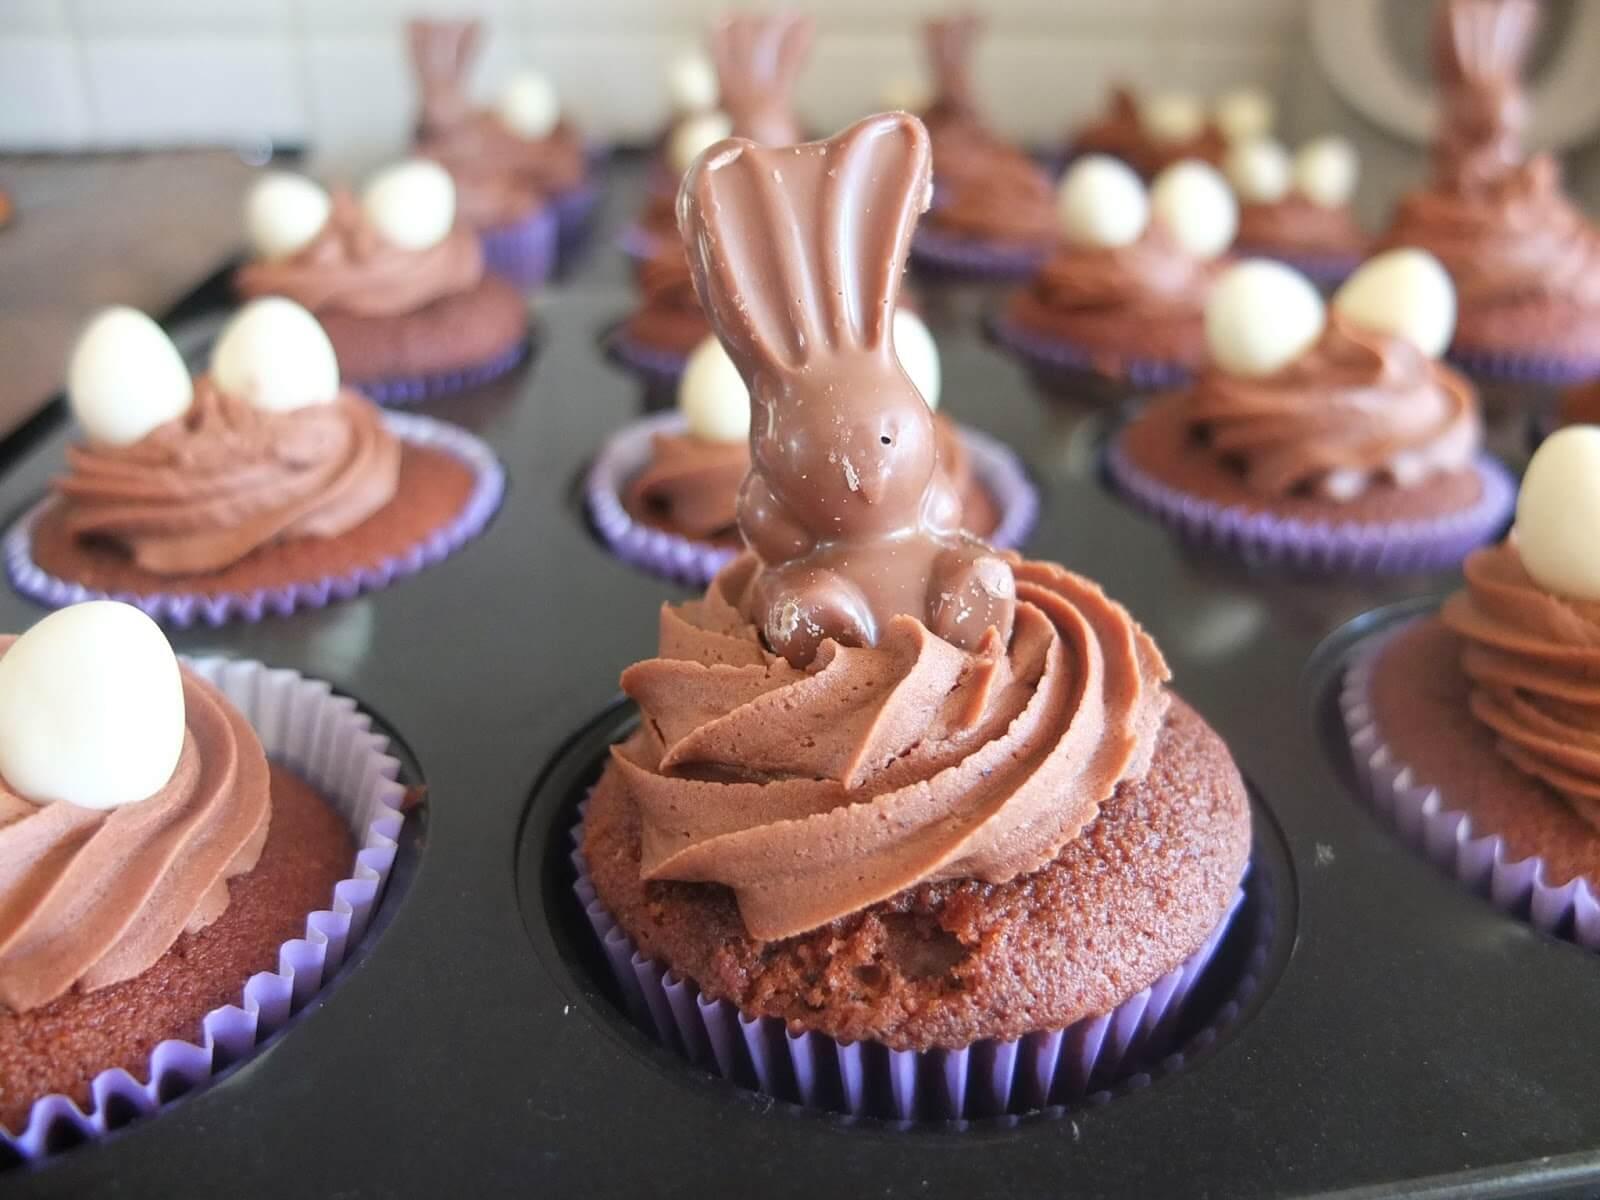 Easter baking inspiration